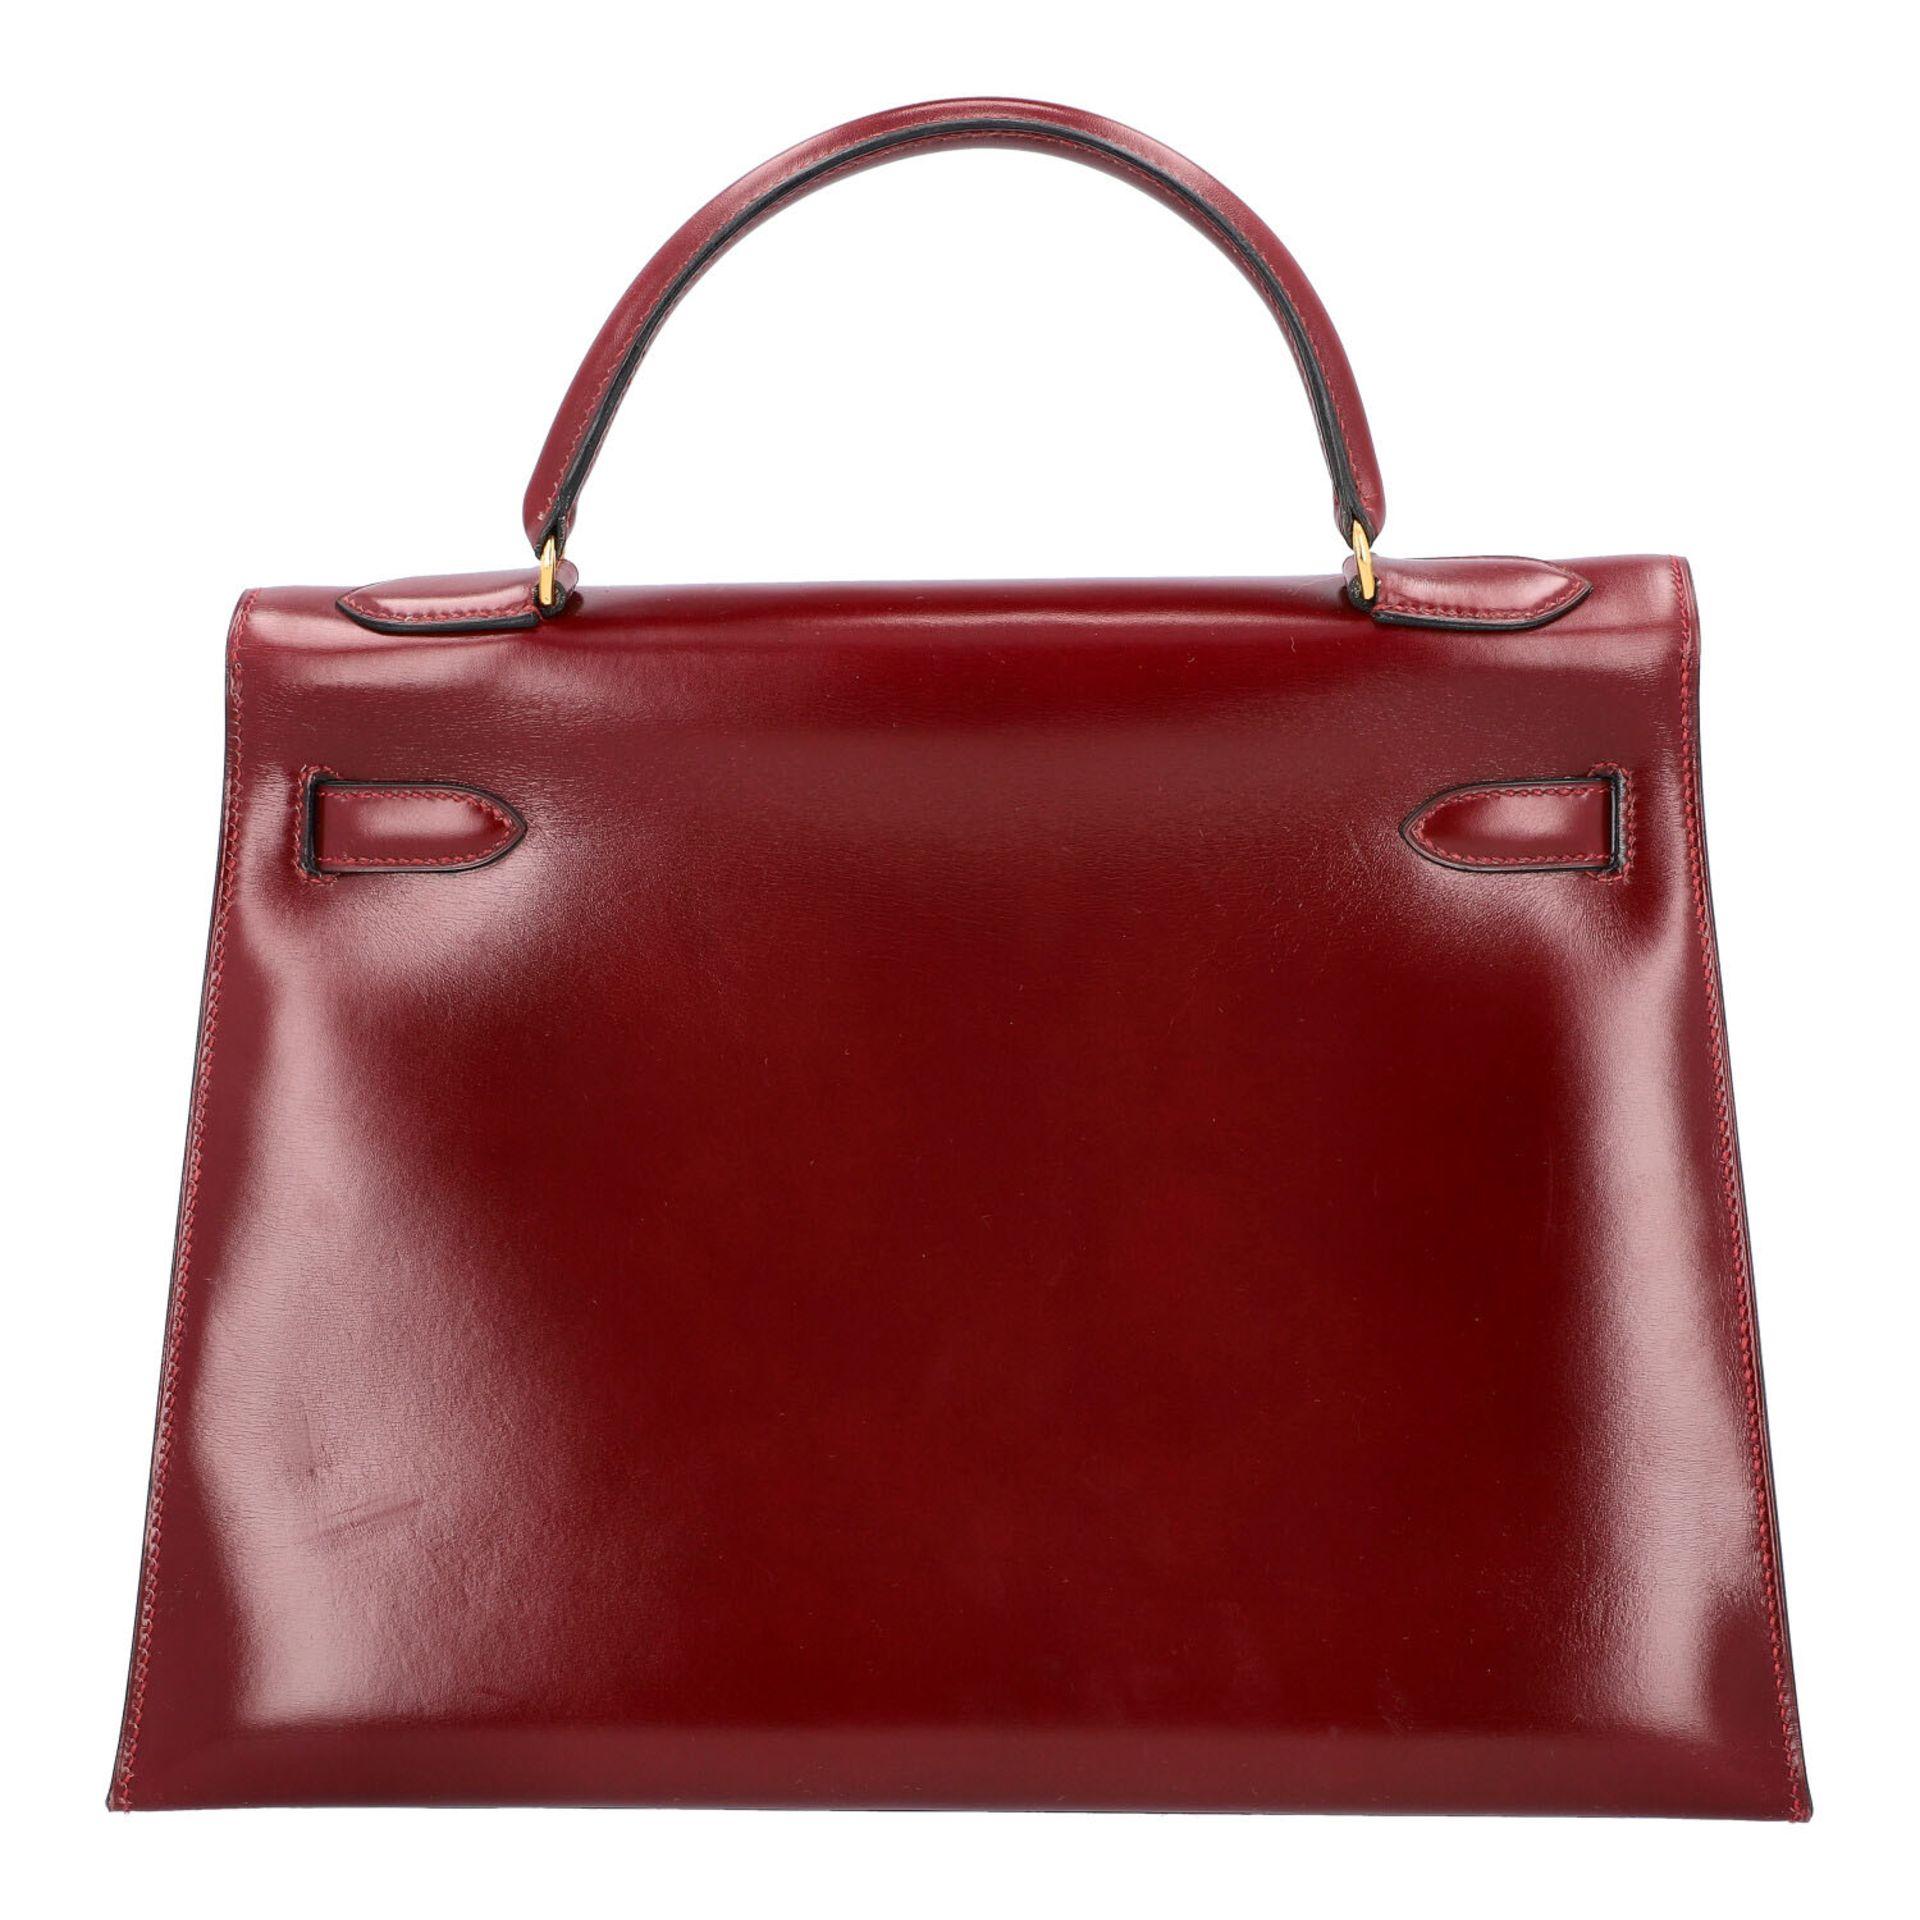 "HERMÈS VINTAGE Handtasche ""KELLY BAG 32"". Koll. 1980. NP. ca.: 8.000,-€. Boxcalf Le - Image 4 of 9"